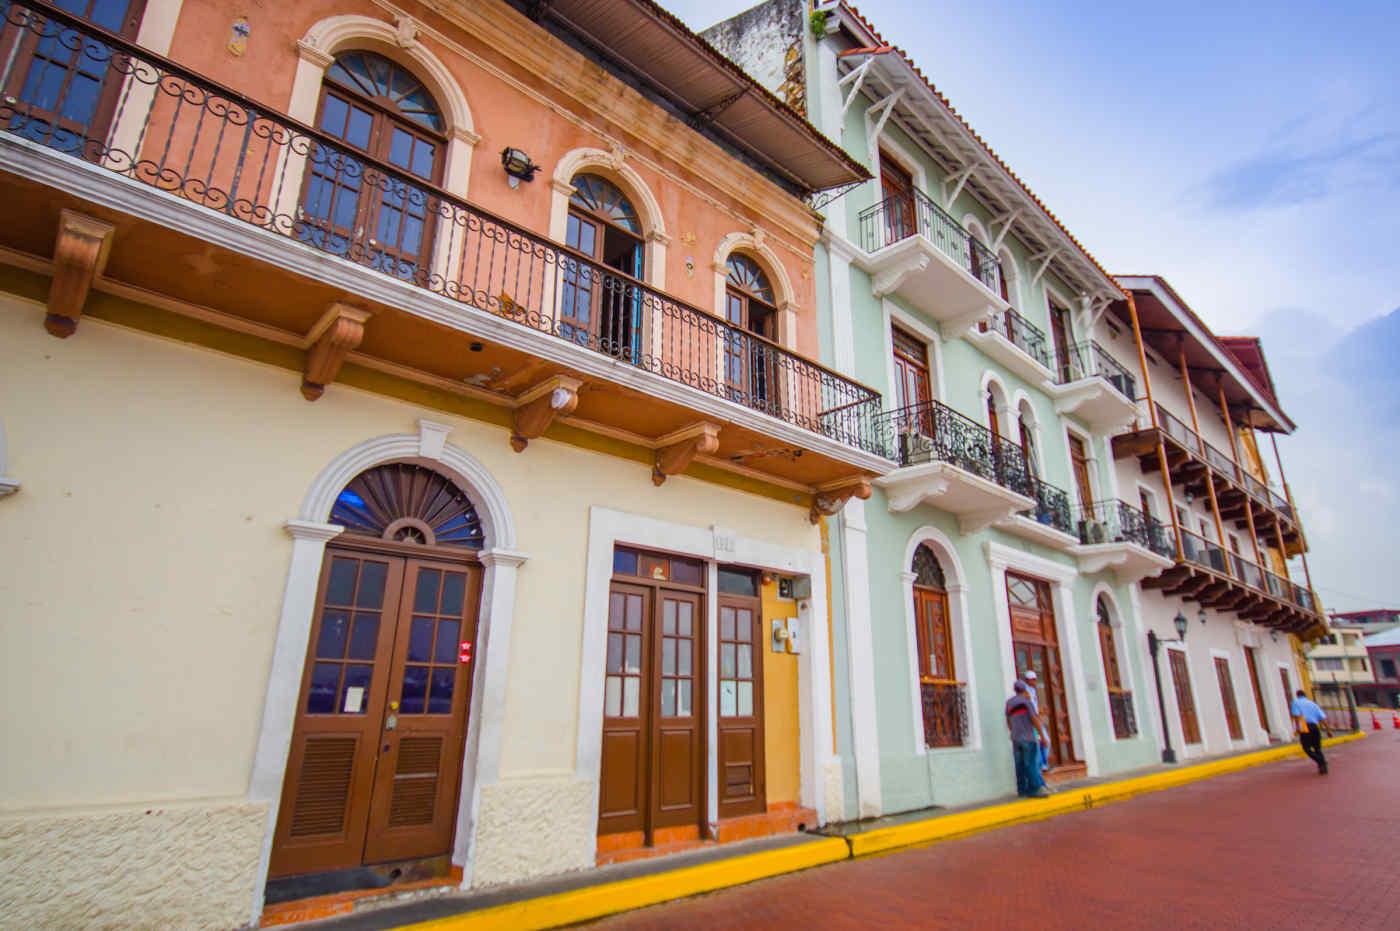 Casco Viejo, the Old Town in Panama City, Panama